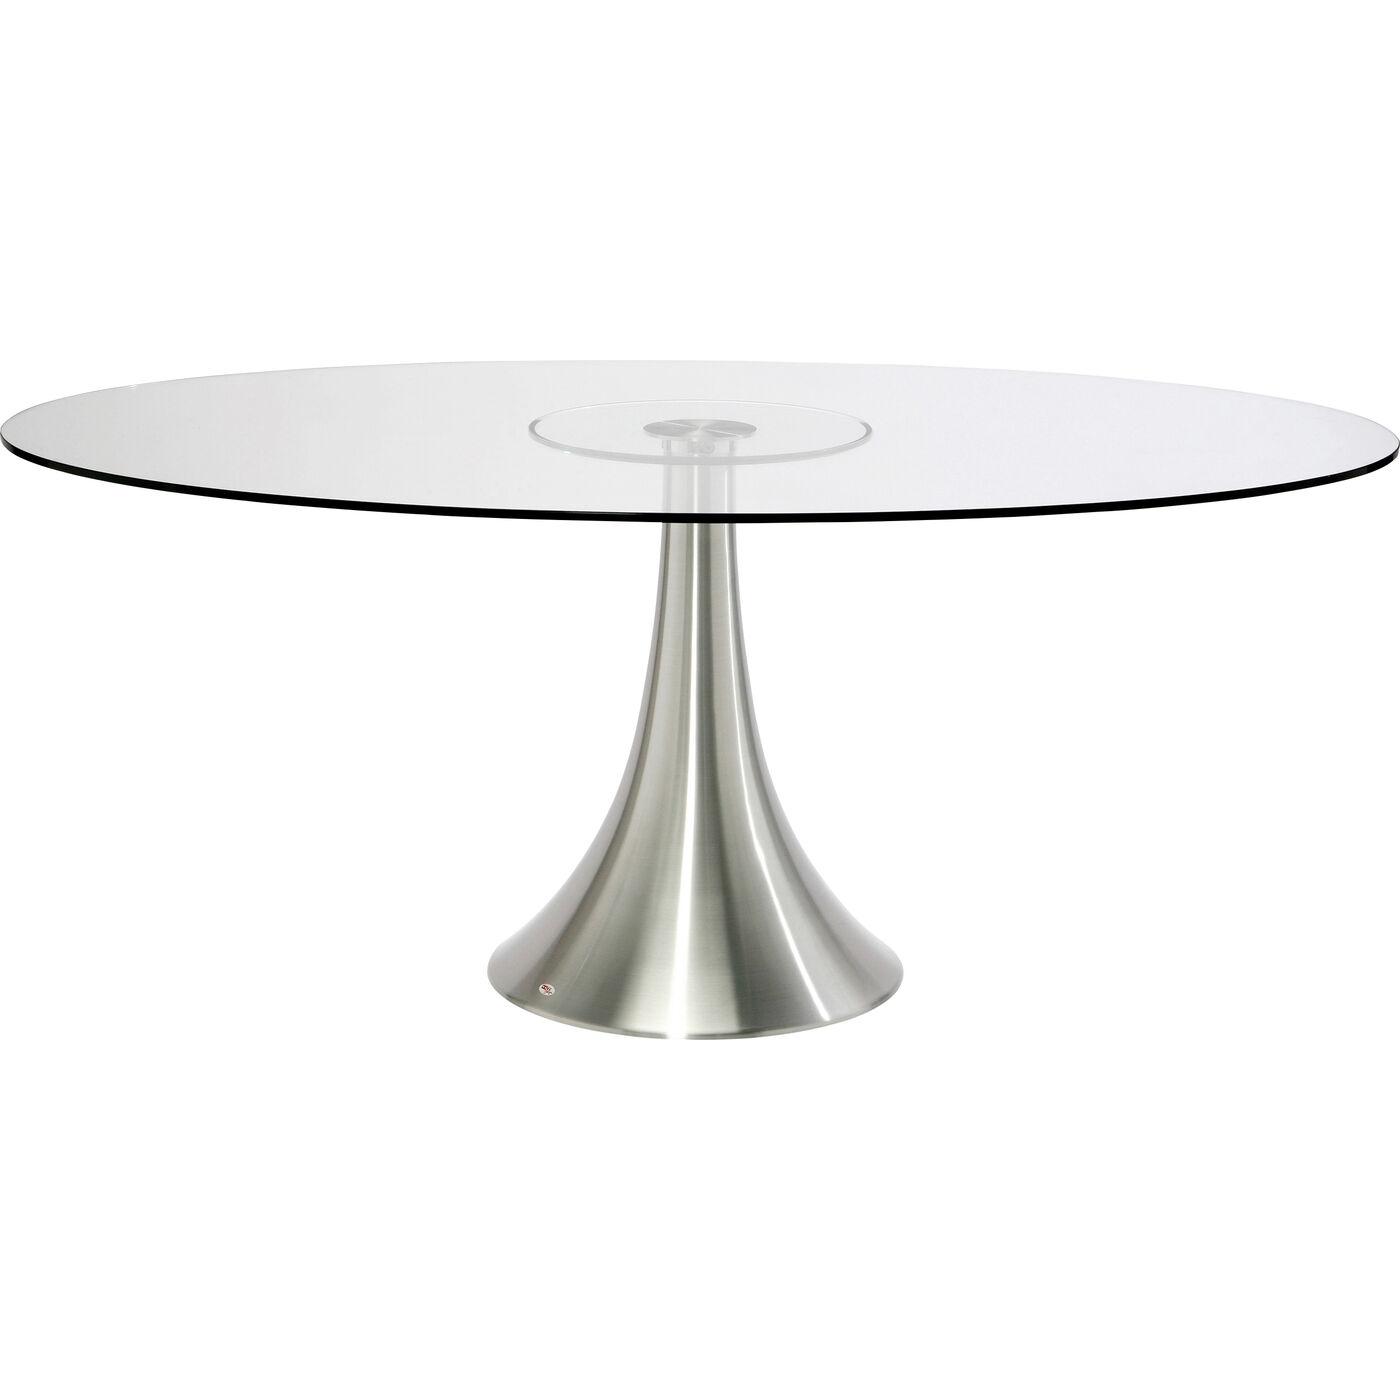 Tisch Grande Possibilita 180x120cm